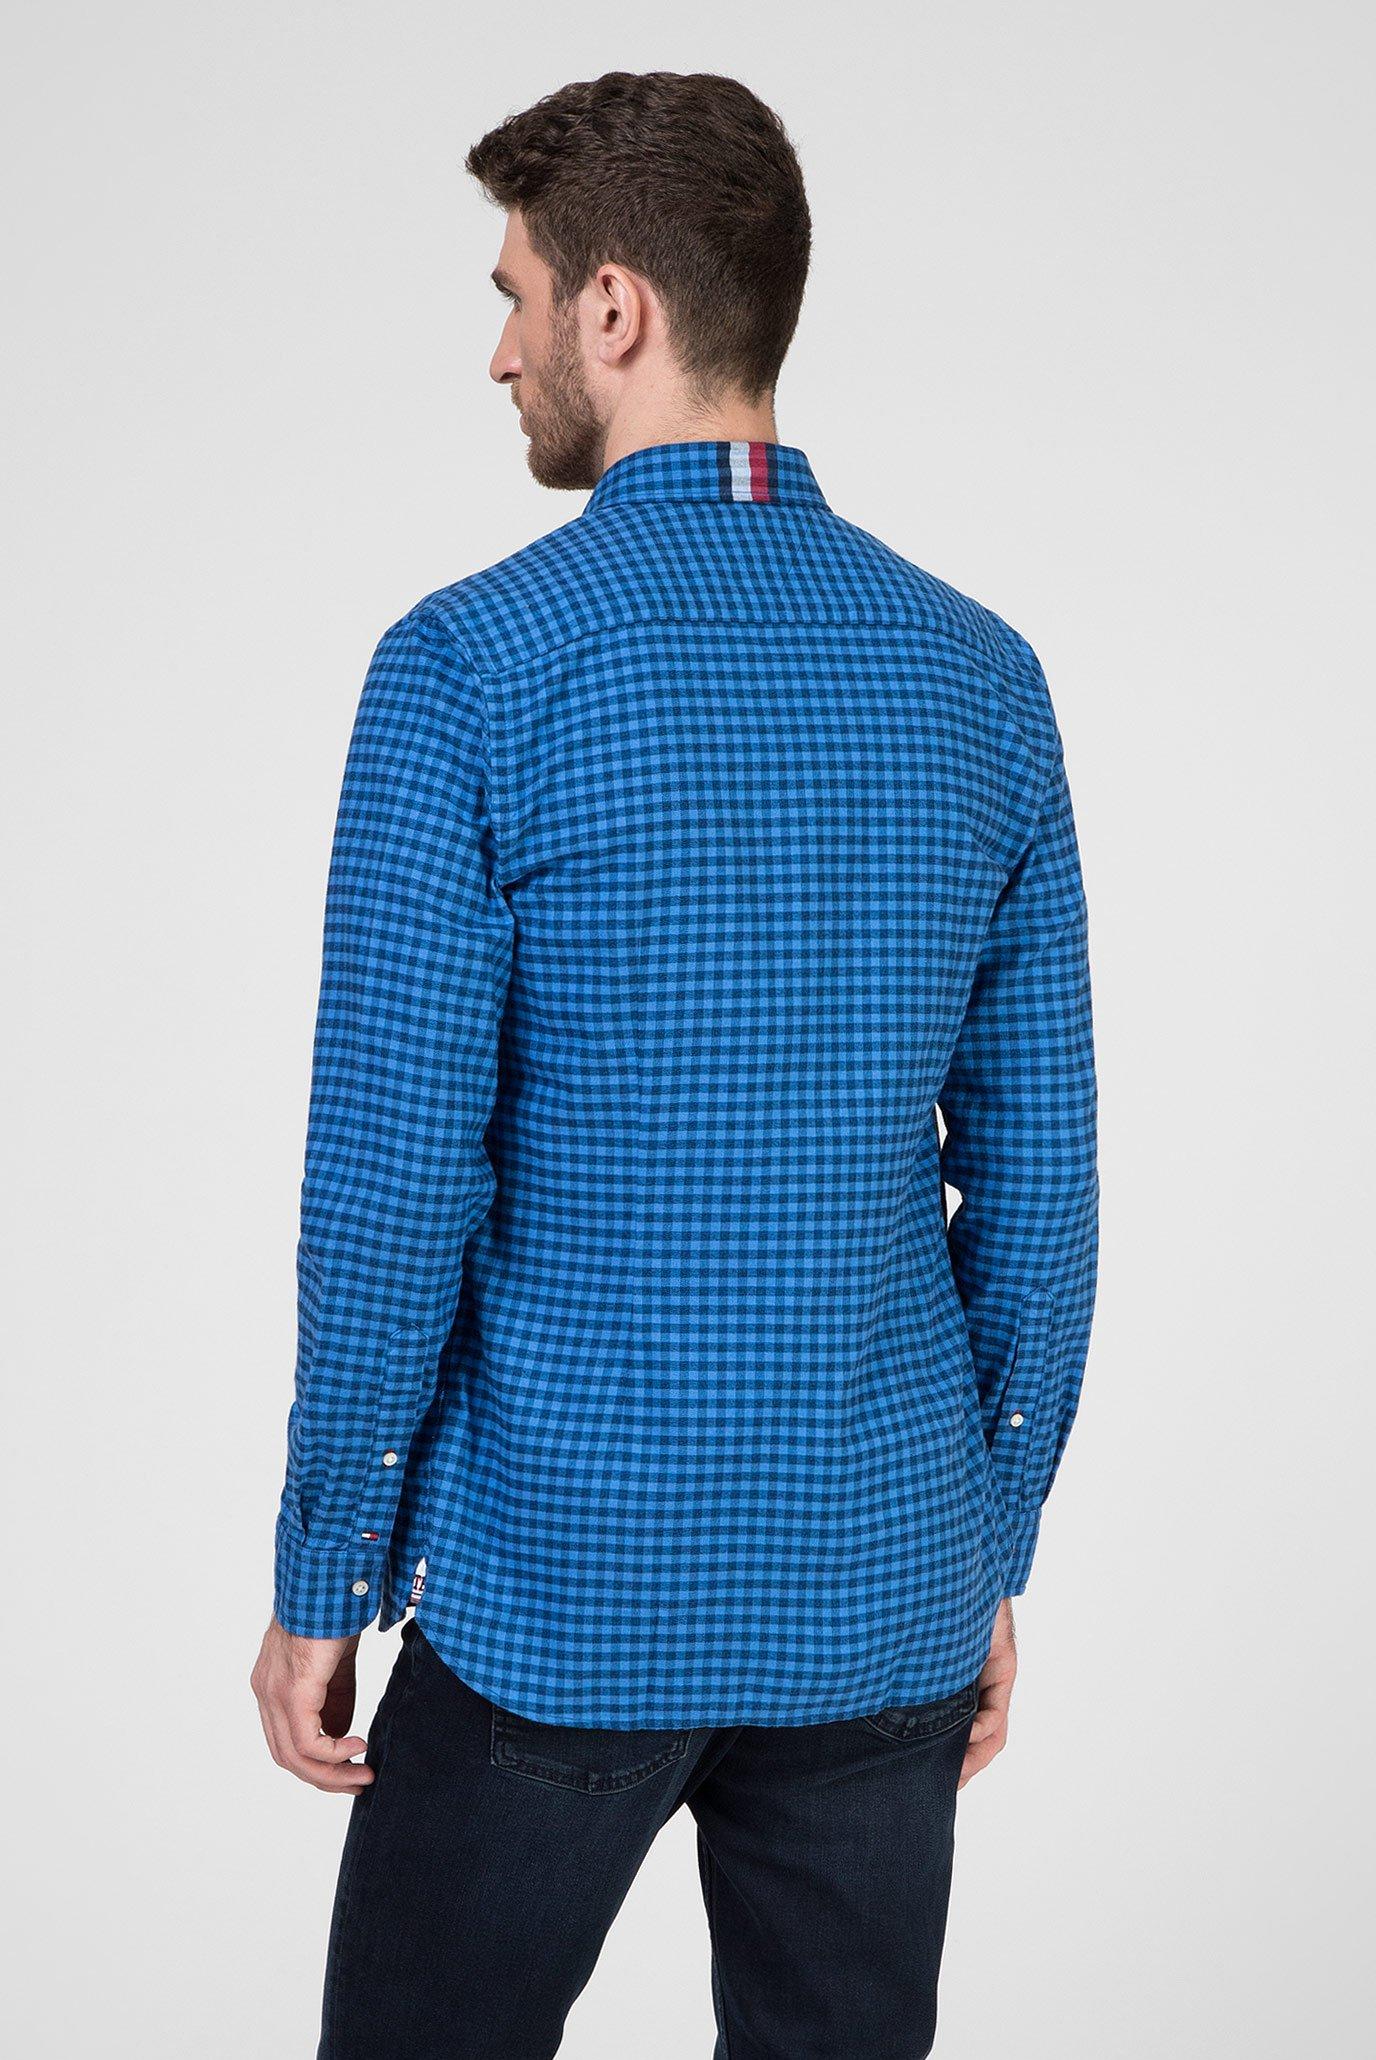 Мужская синяя рубашка в клетку SLIM GLOBAL STRIPE GINGHAM Tommy Hilfiger